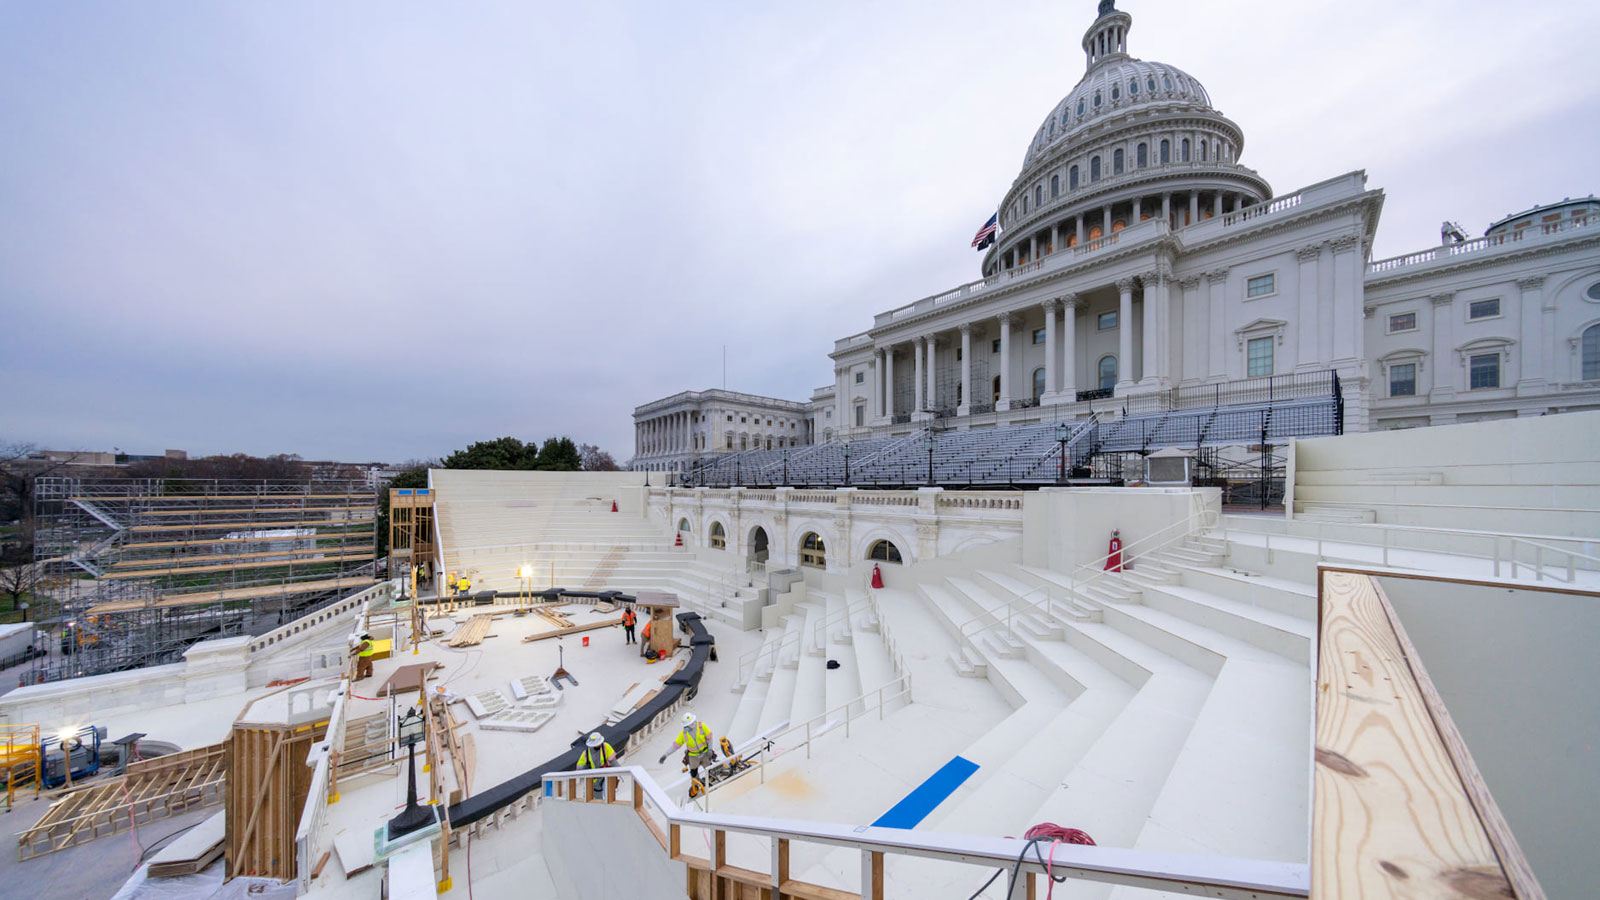 Preparing for inauguration